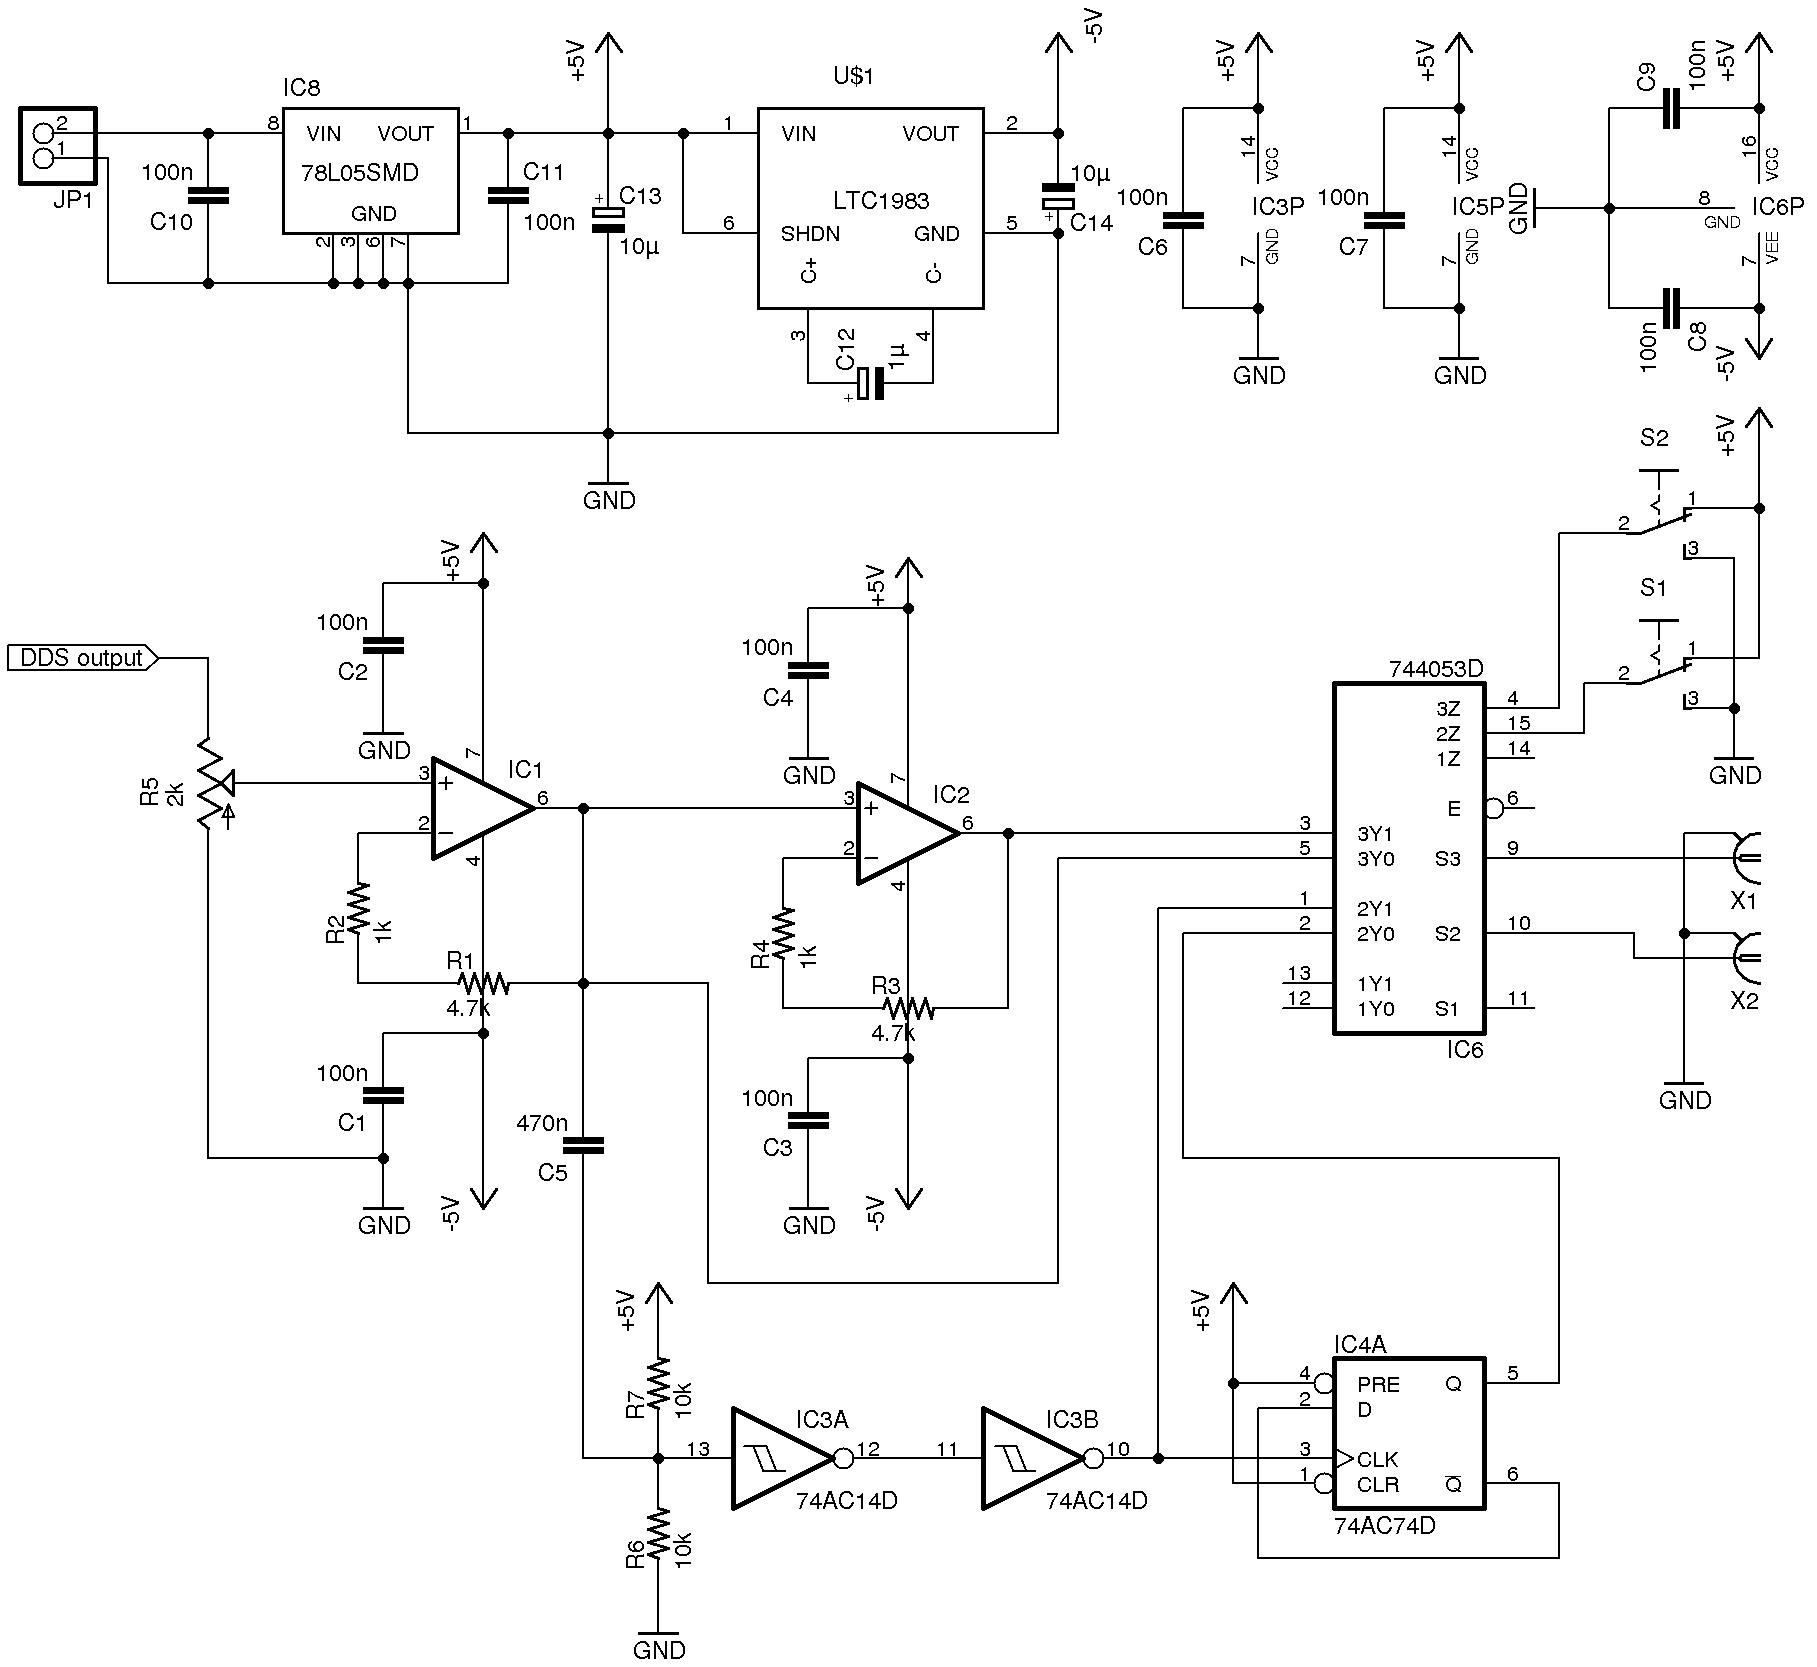 hight resolution of wiring diagram for a turnigy 9x wiring diagrams wiring kk2 1 5 motor hextronik kk2